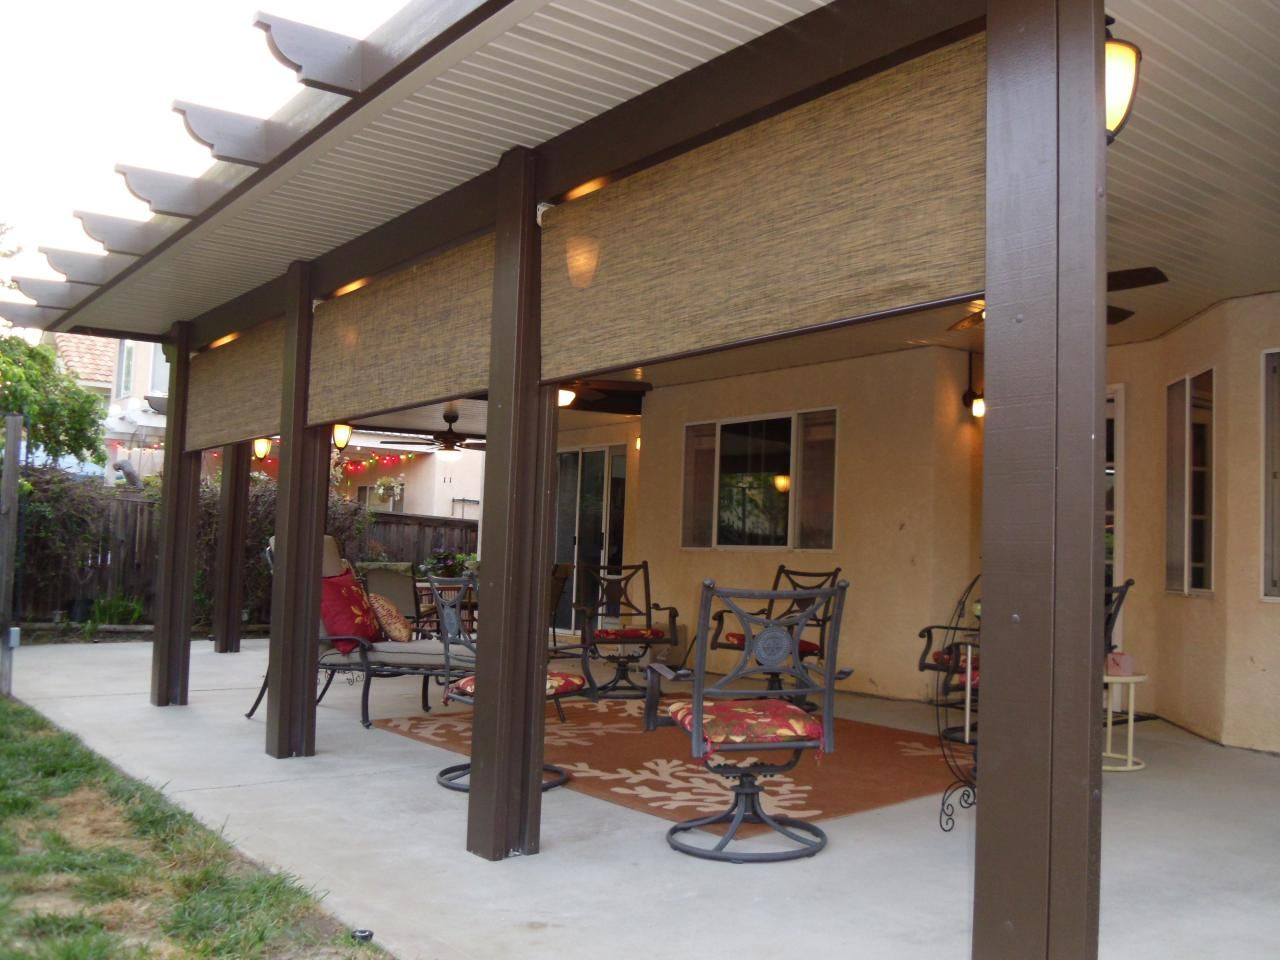 Solid Alumawood Patio Cover - Temecula, CA | Kitchen ideas ...